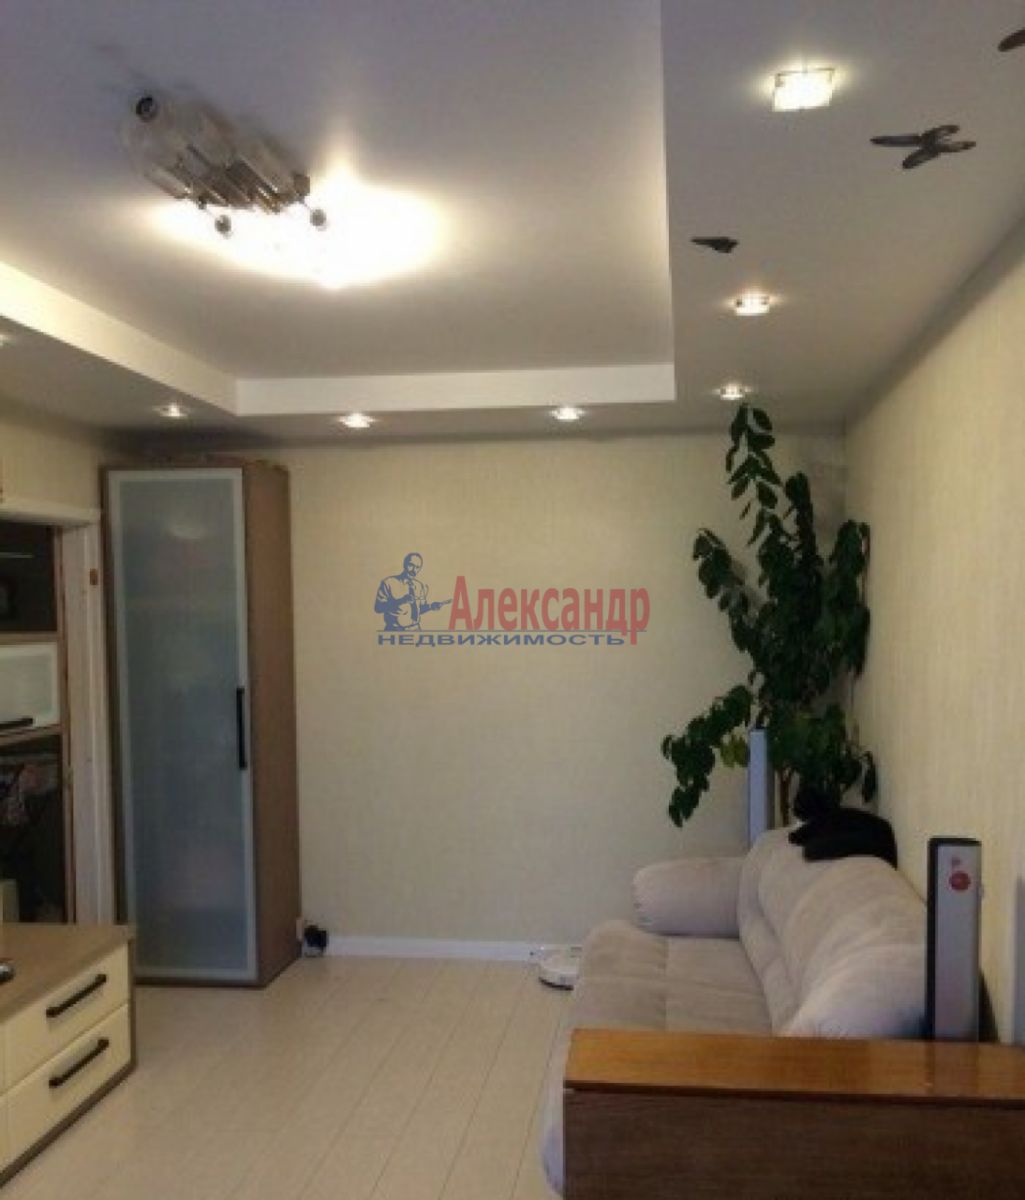 2-комнатная квартира (50м2) в аренду по адресу Ленинский пр., 176— фото 3 из 9